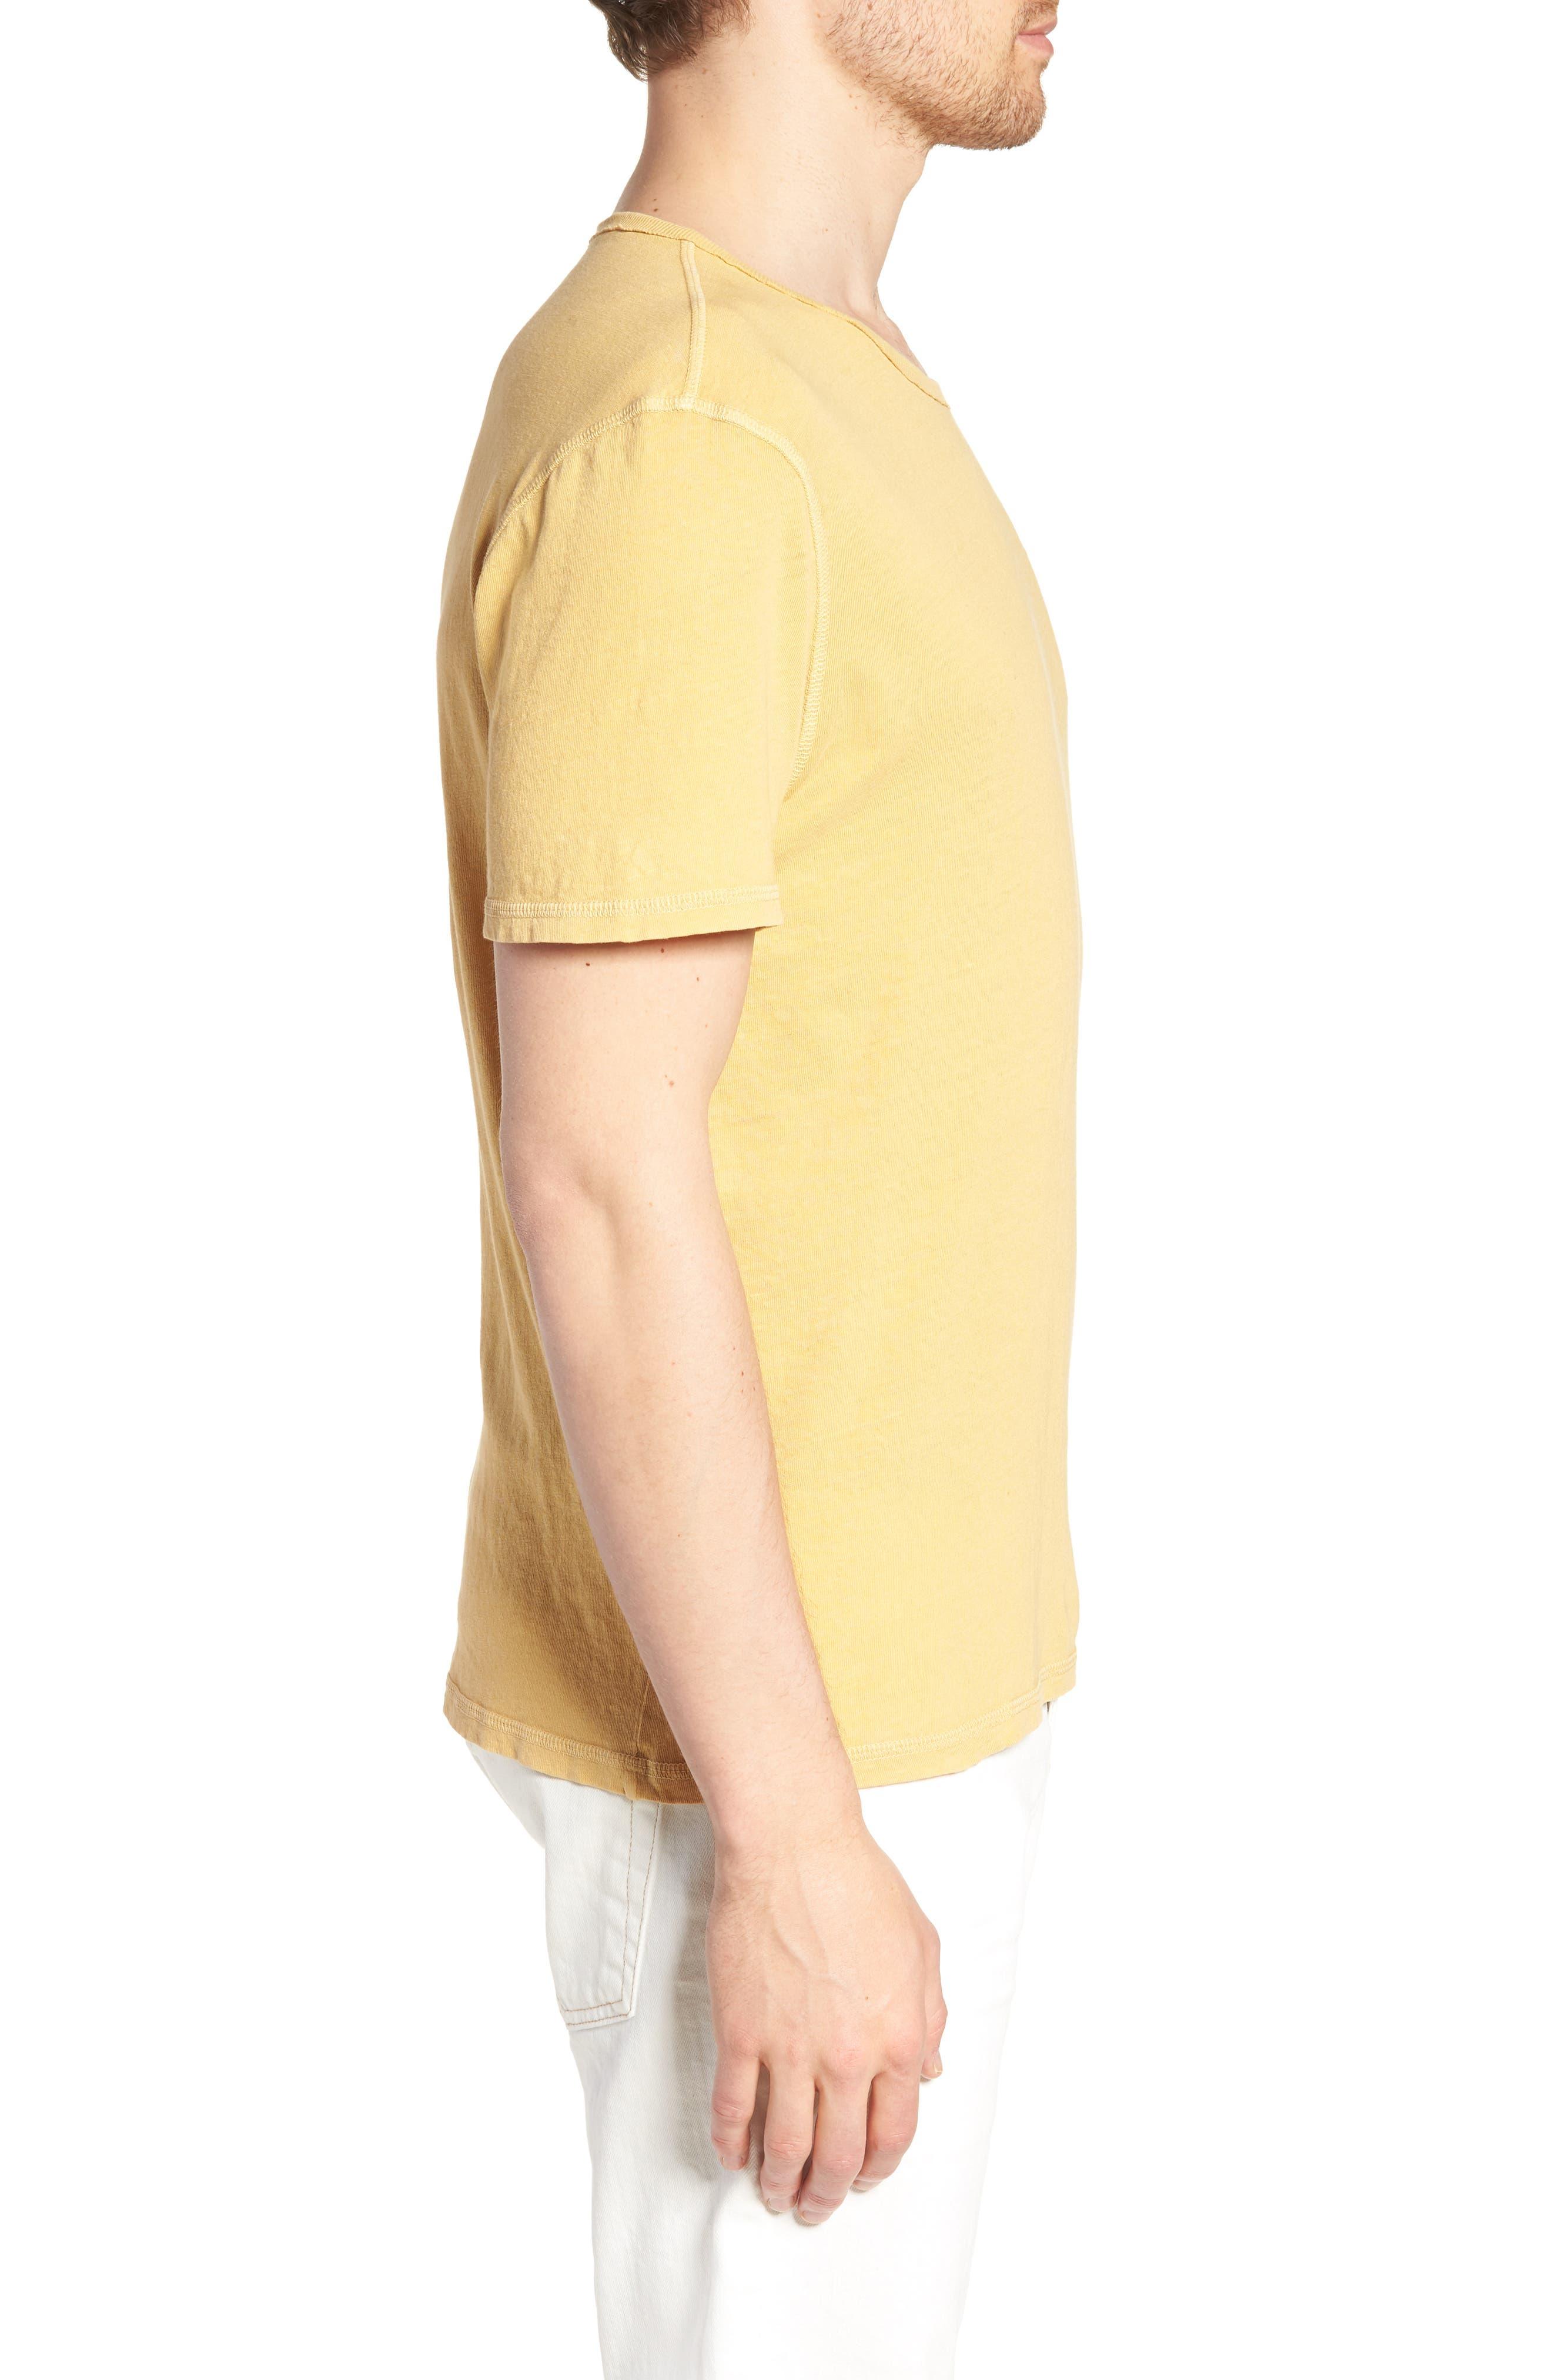 Ramsey Slim Fit Crewneck T-Shirt,                             Alternate thumbnail 3, color,                             Weathered Golden Emmer